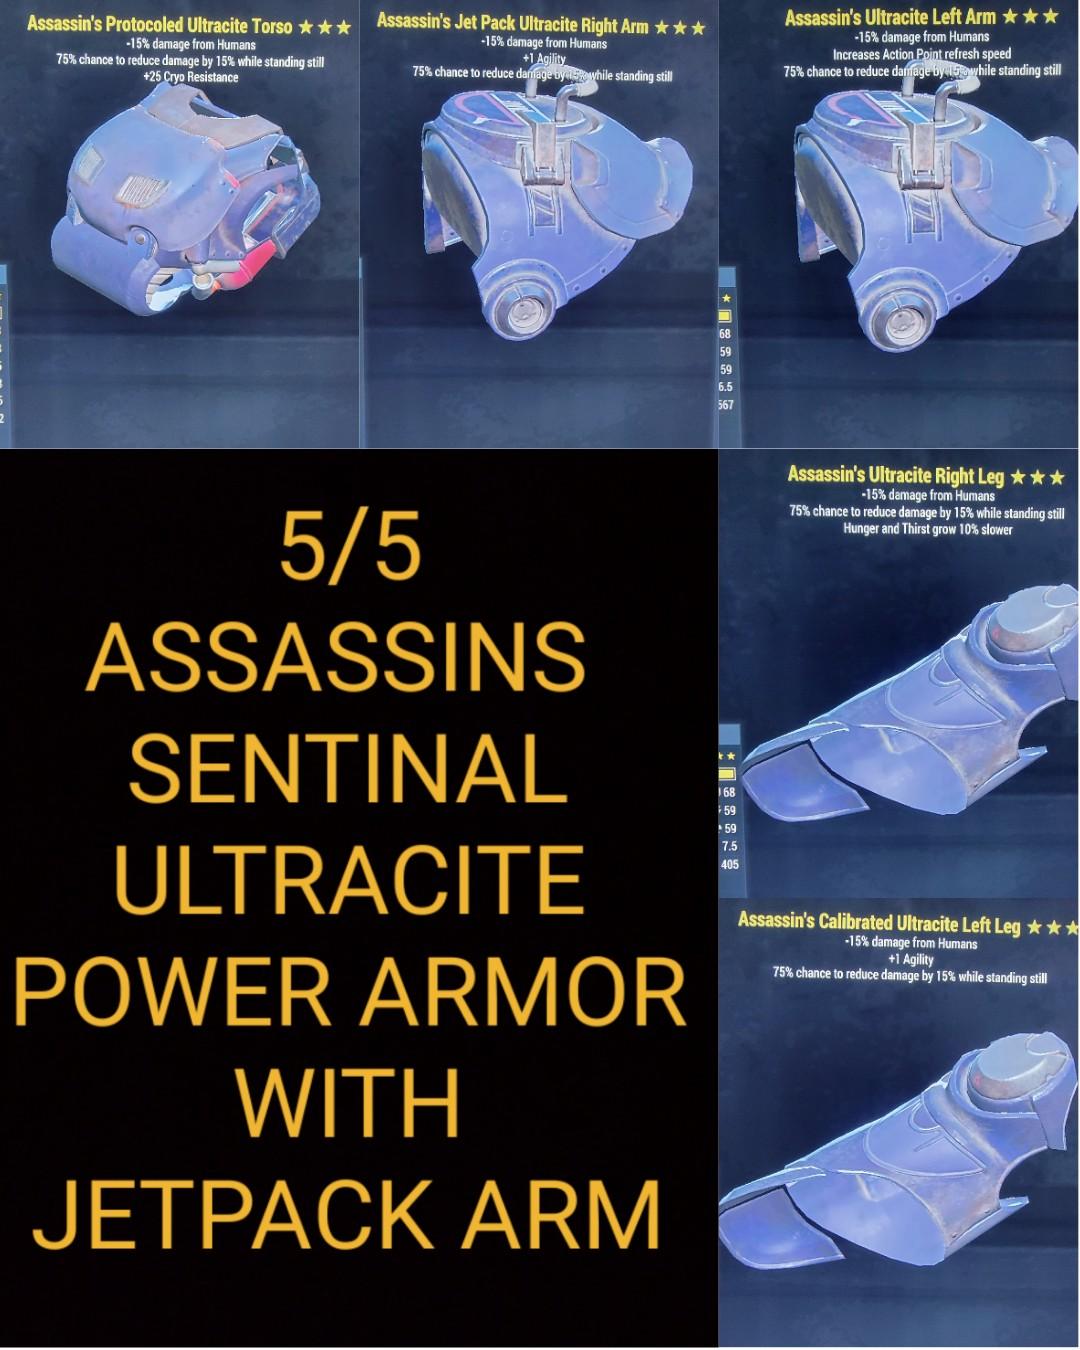 Assassins Sentinal Ultracite Power Armor Set With Jetpack Arm